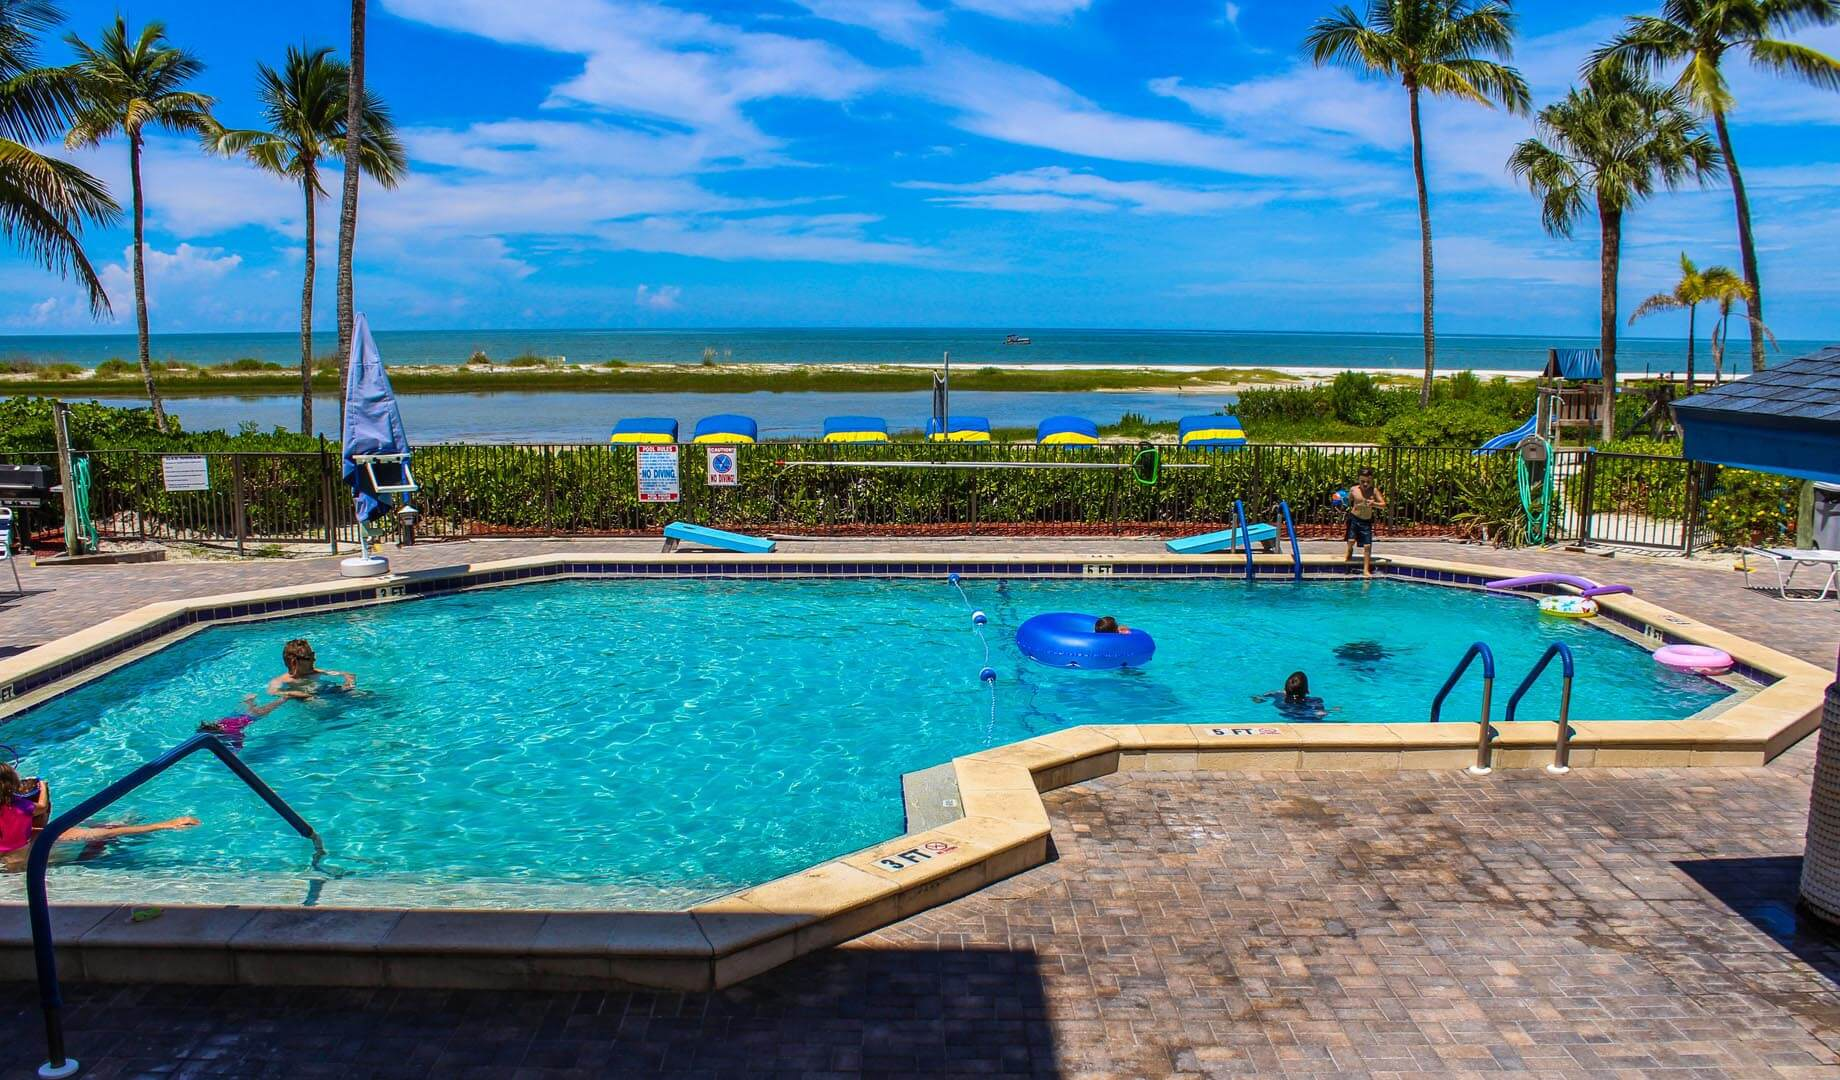 Mariner's Boathouse - Resort Amenities - Pool